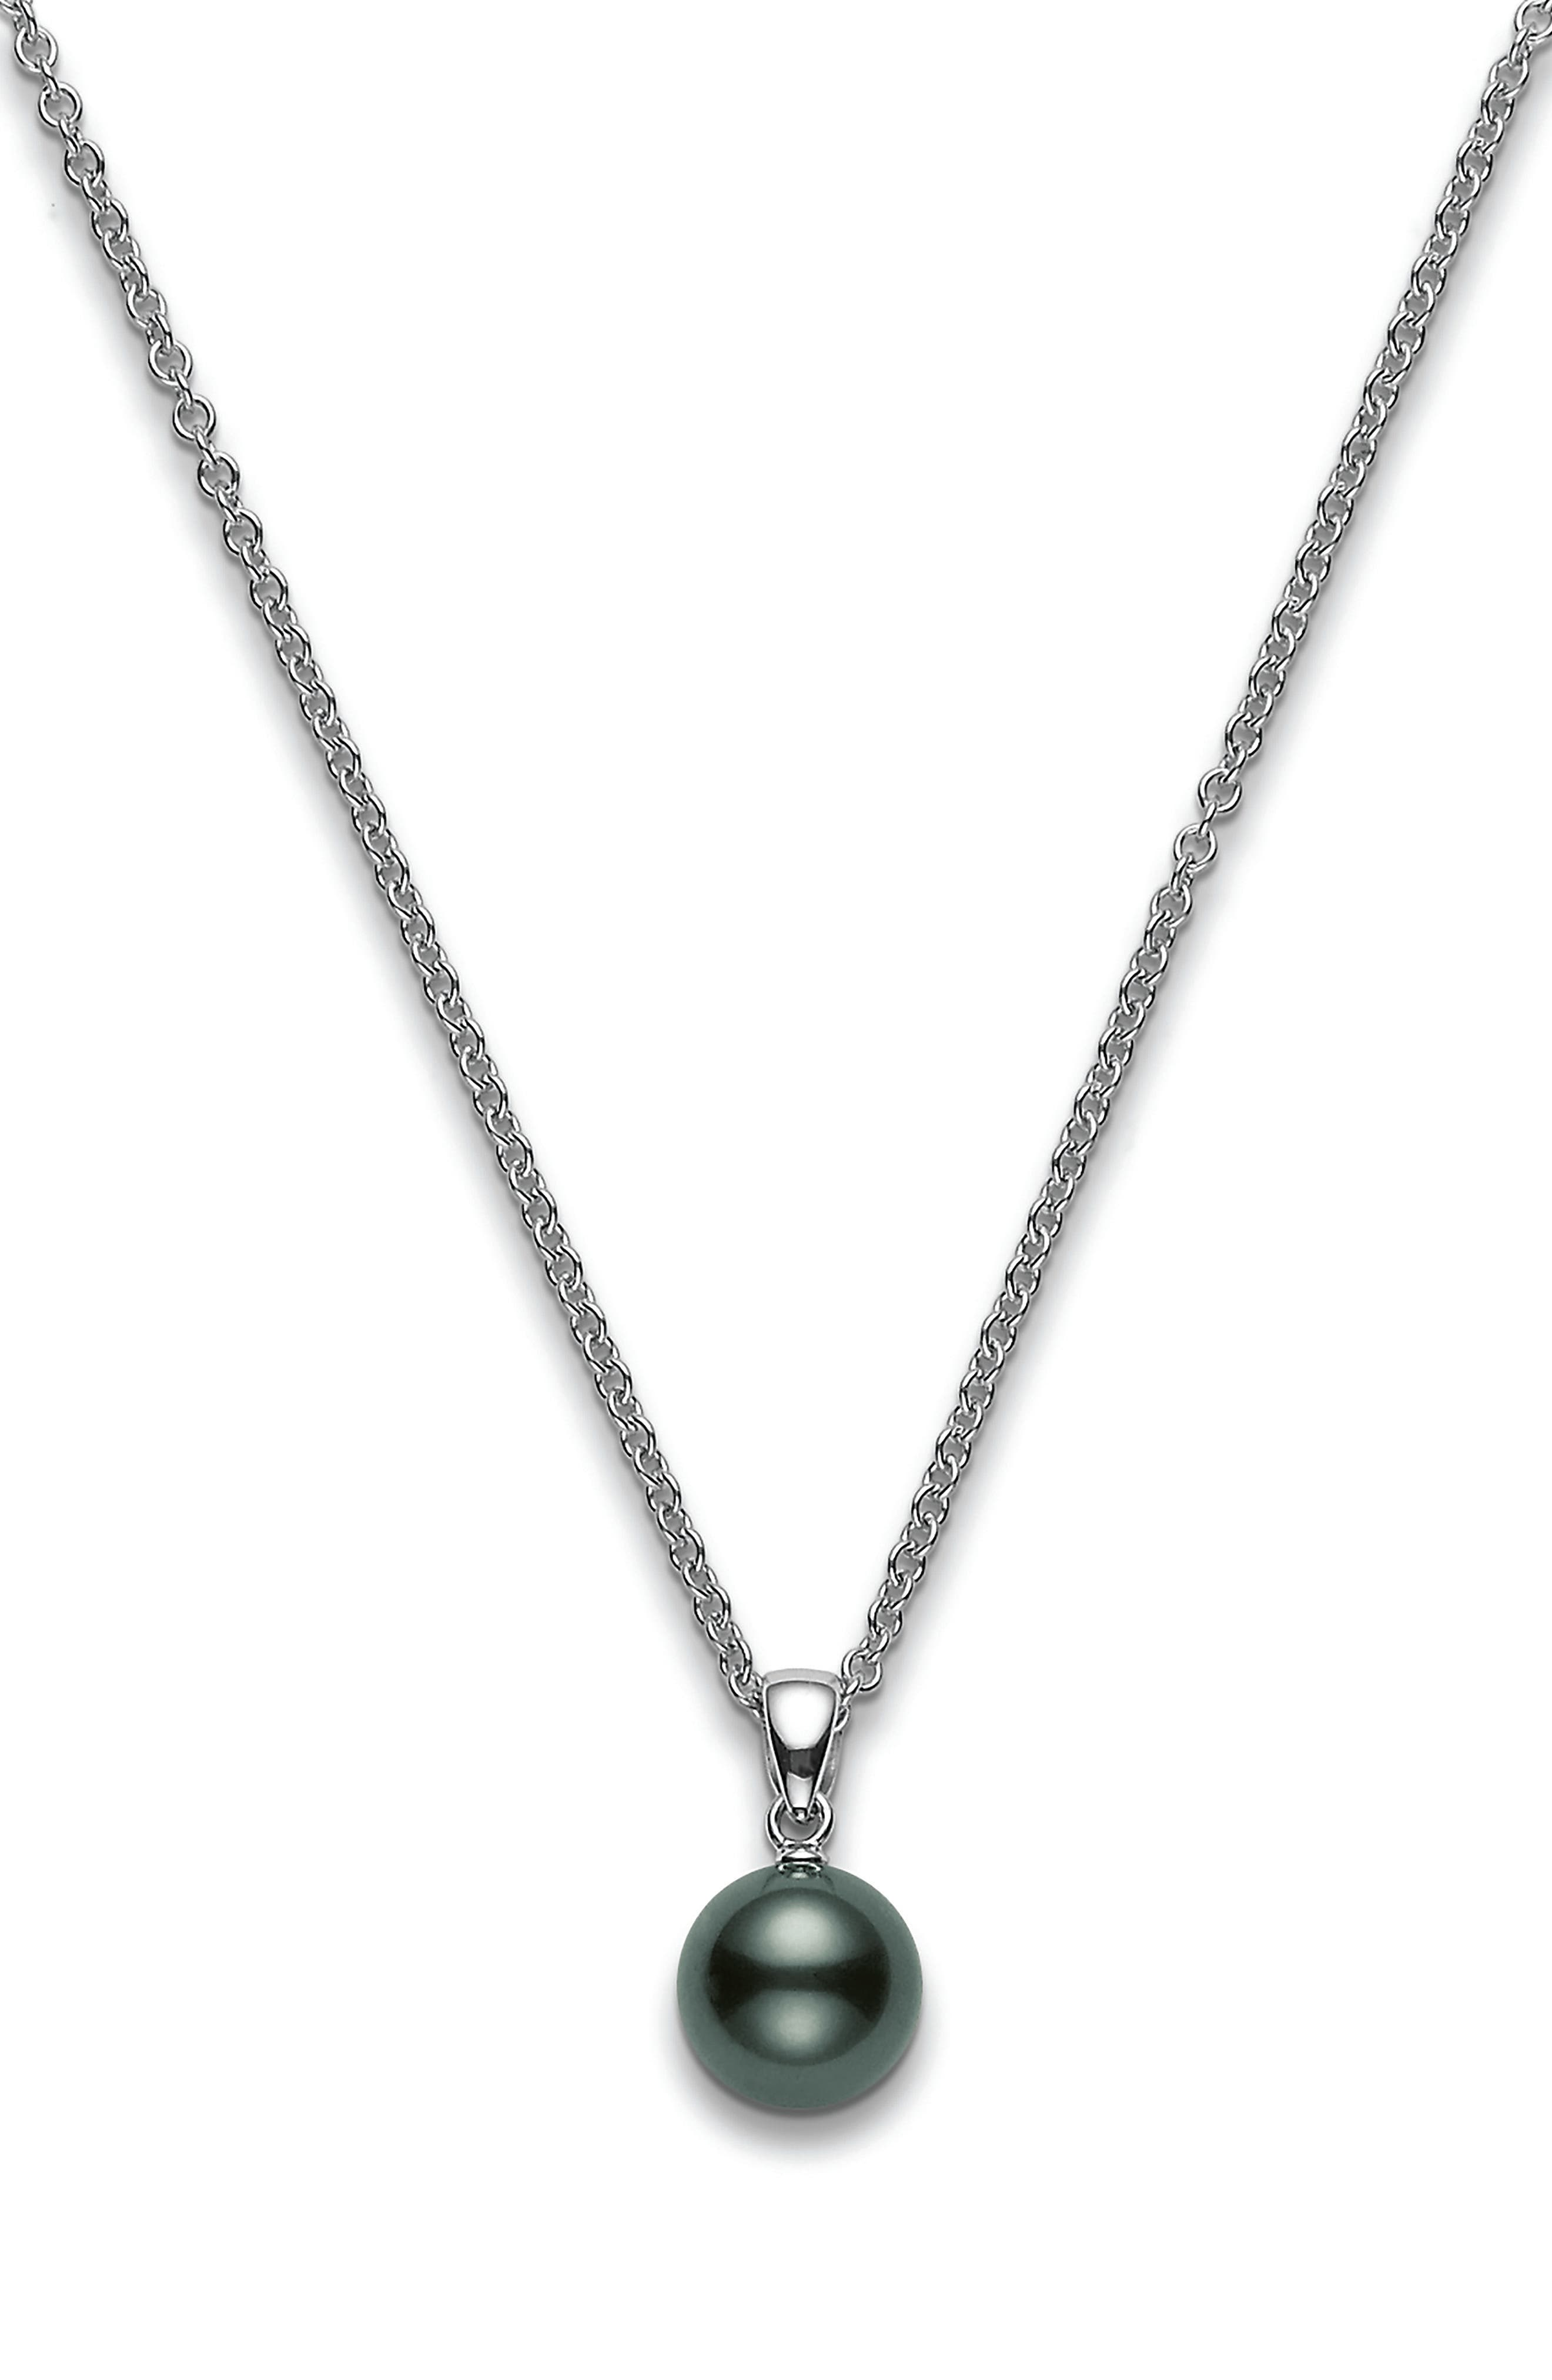 Black South Sea Pearl Pendant Necklace